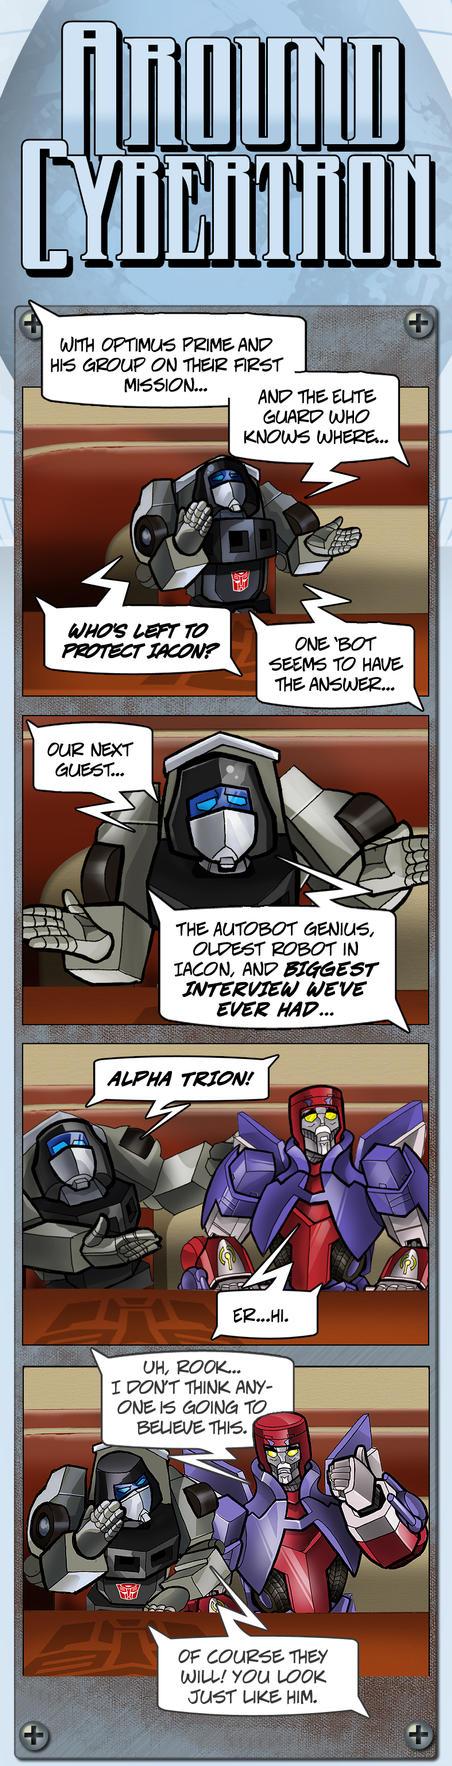 Around Cybertron Part 16 by RID-NightViper